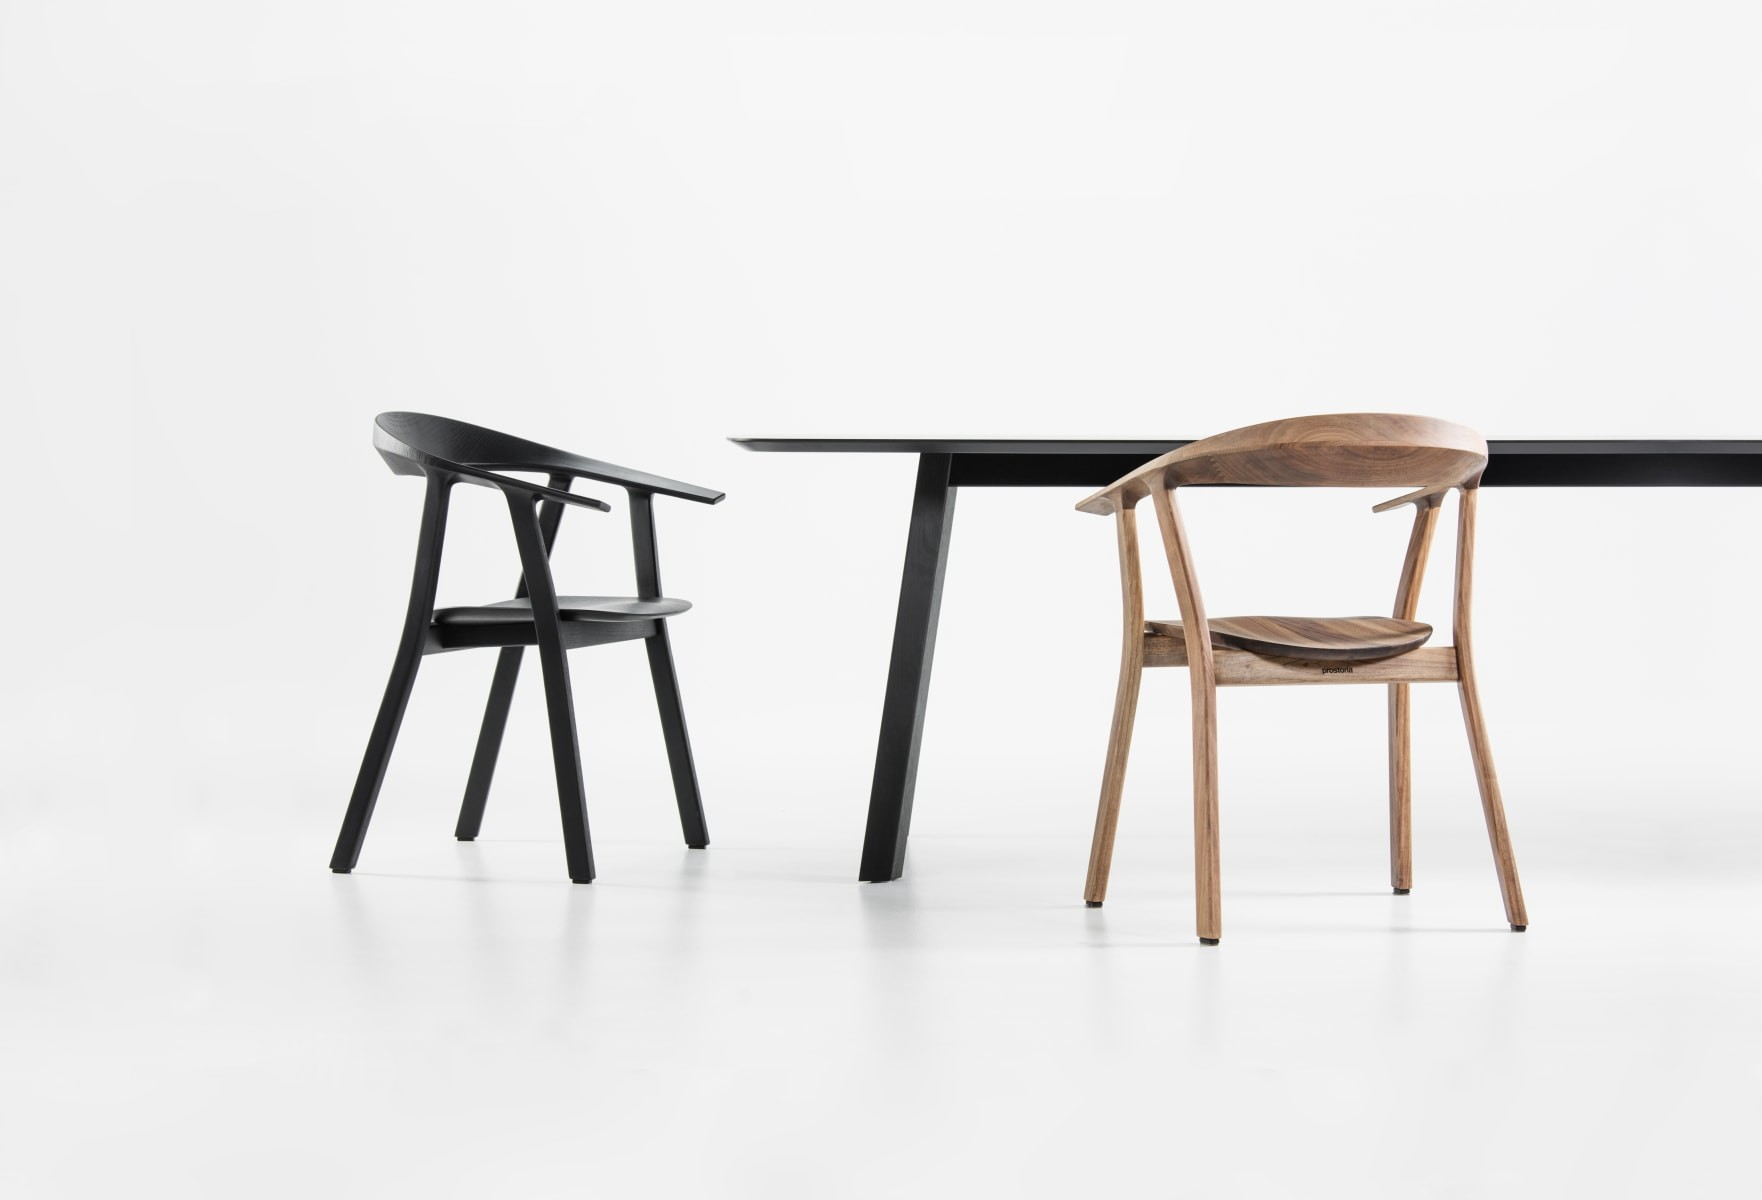 Tisch rohmb prostoria 01